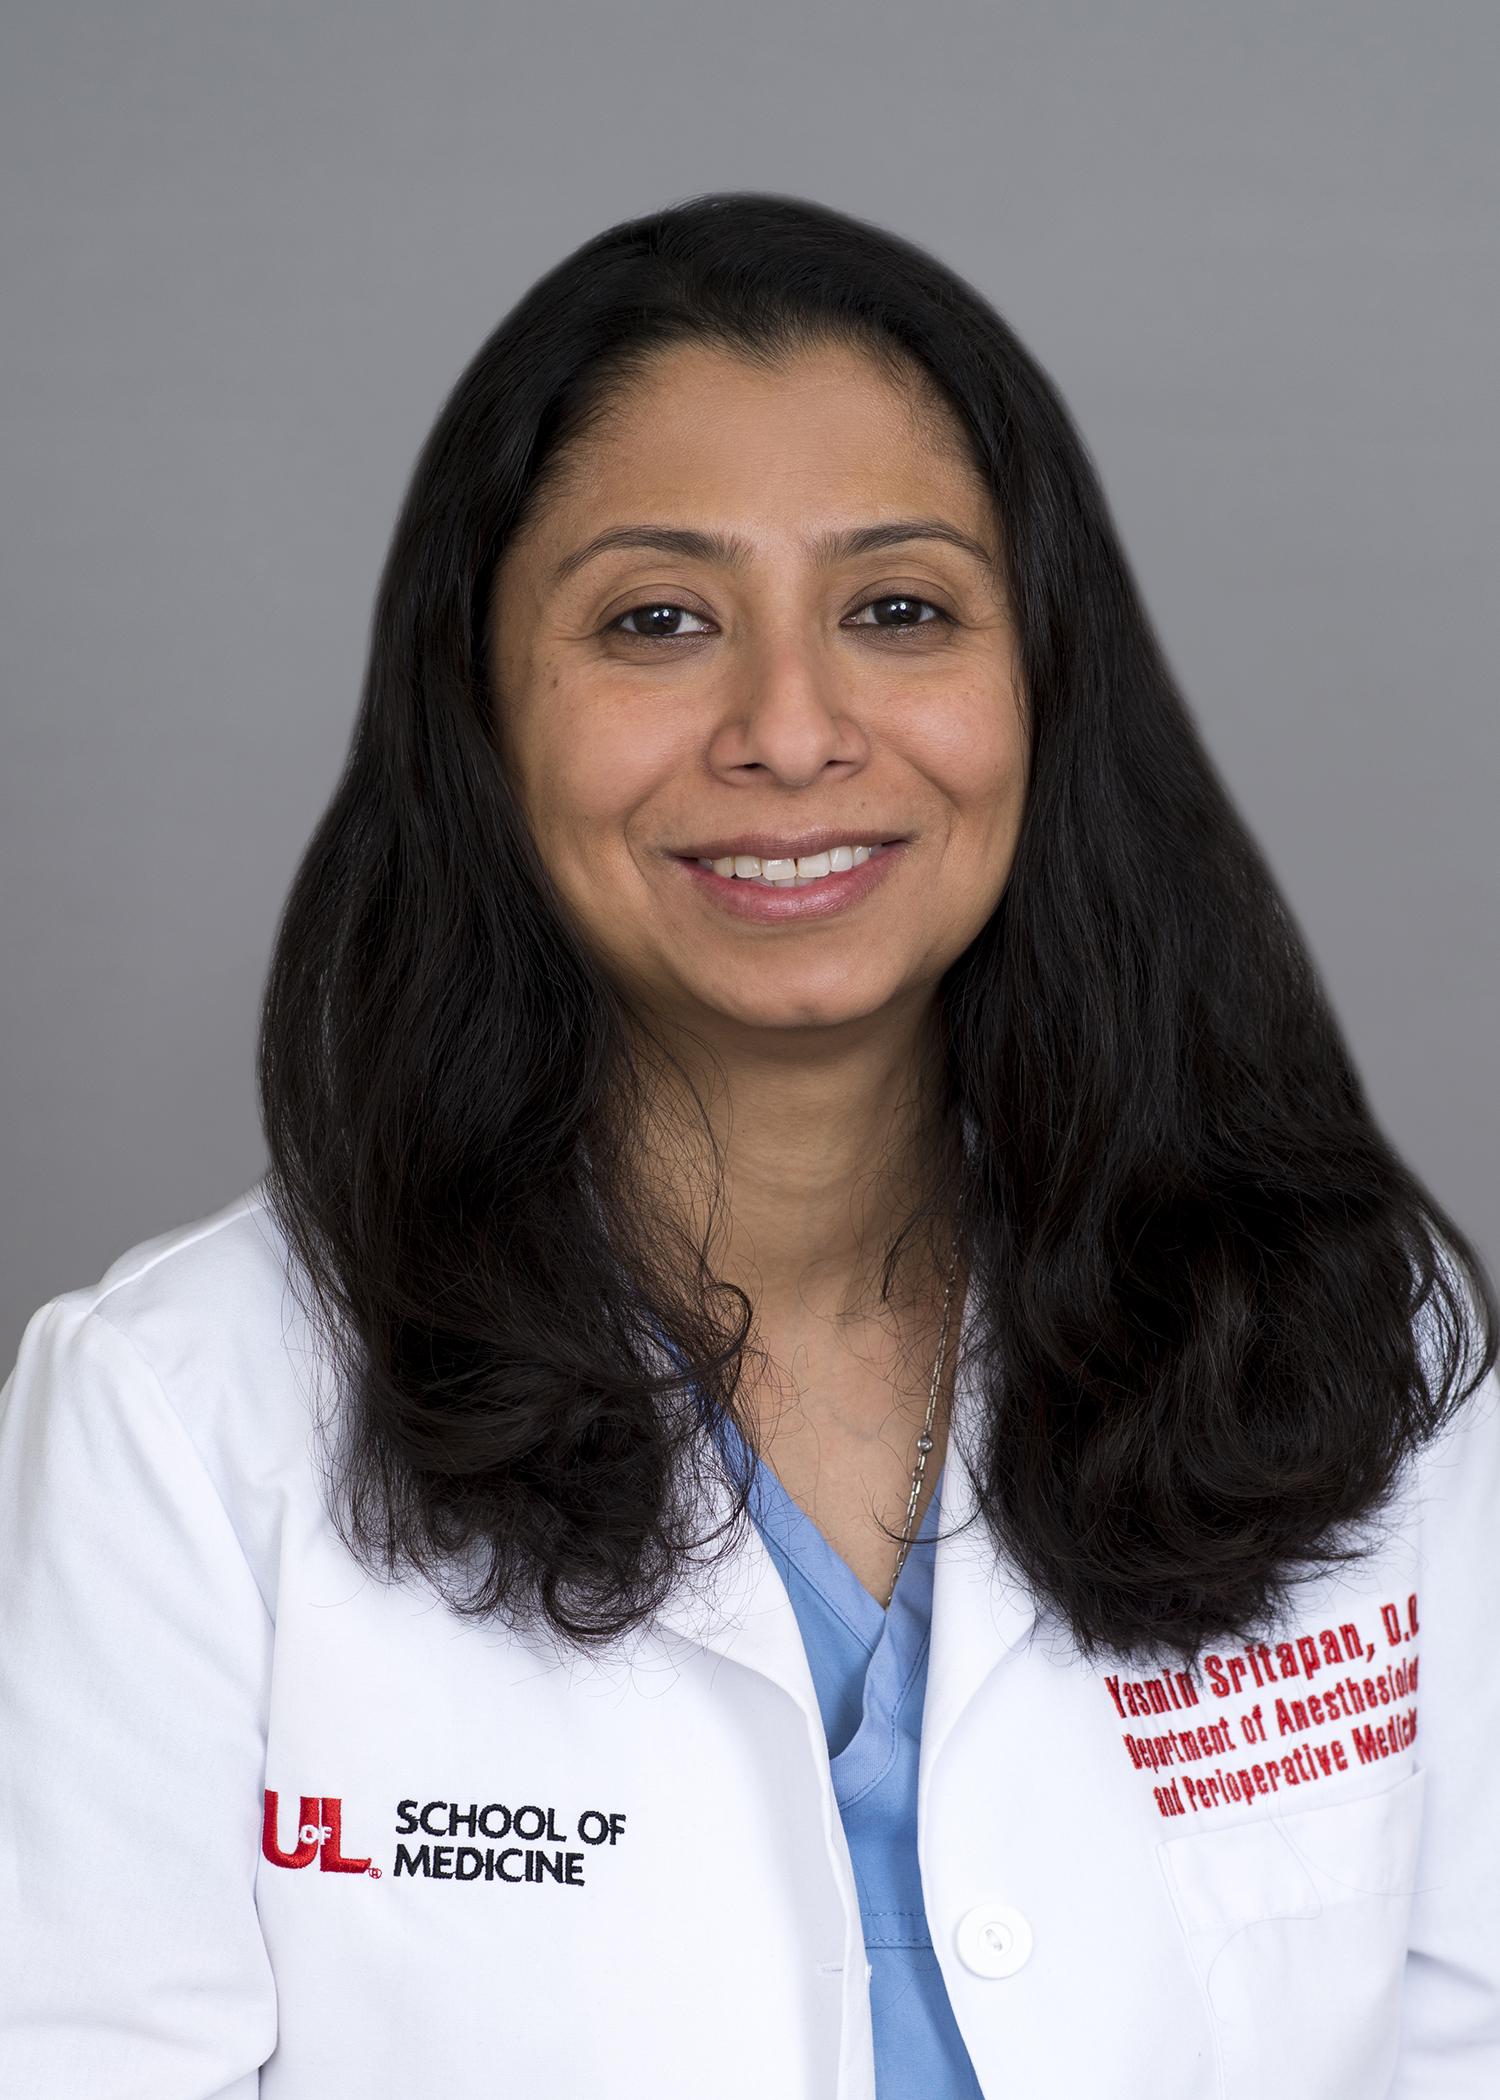 Dr. Yasmin Sritapan